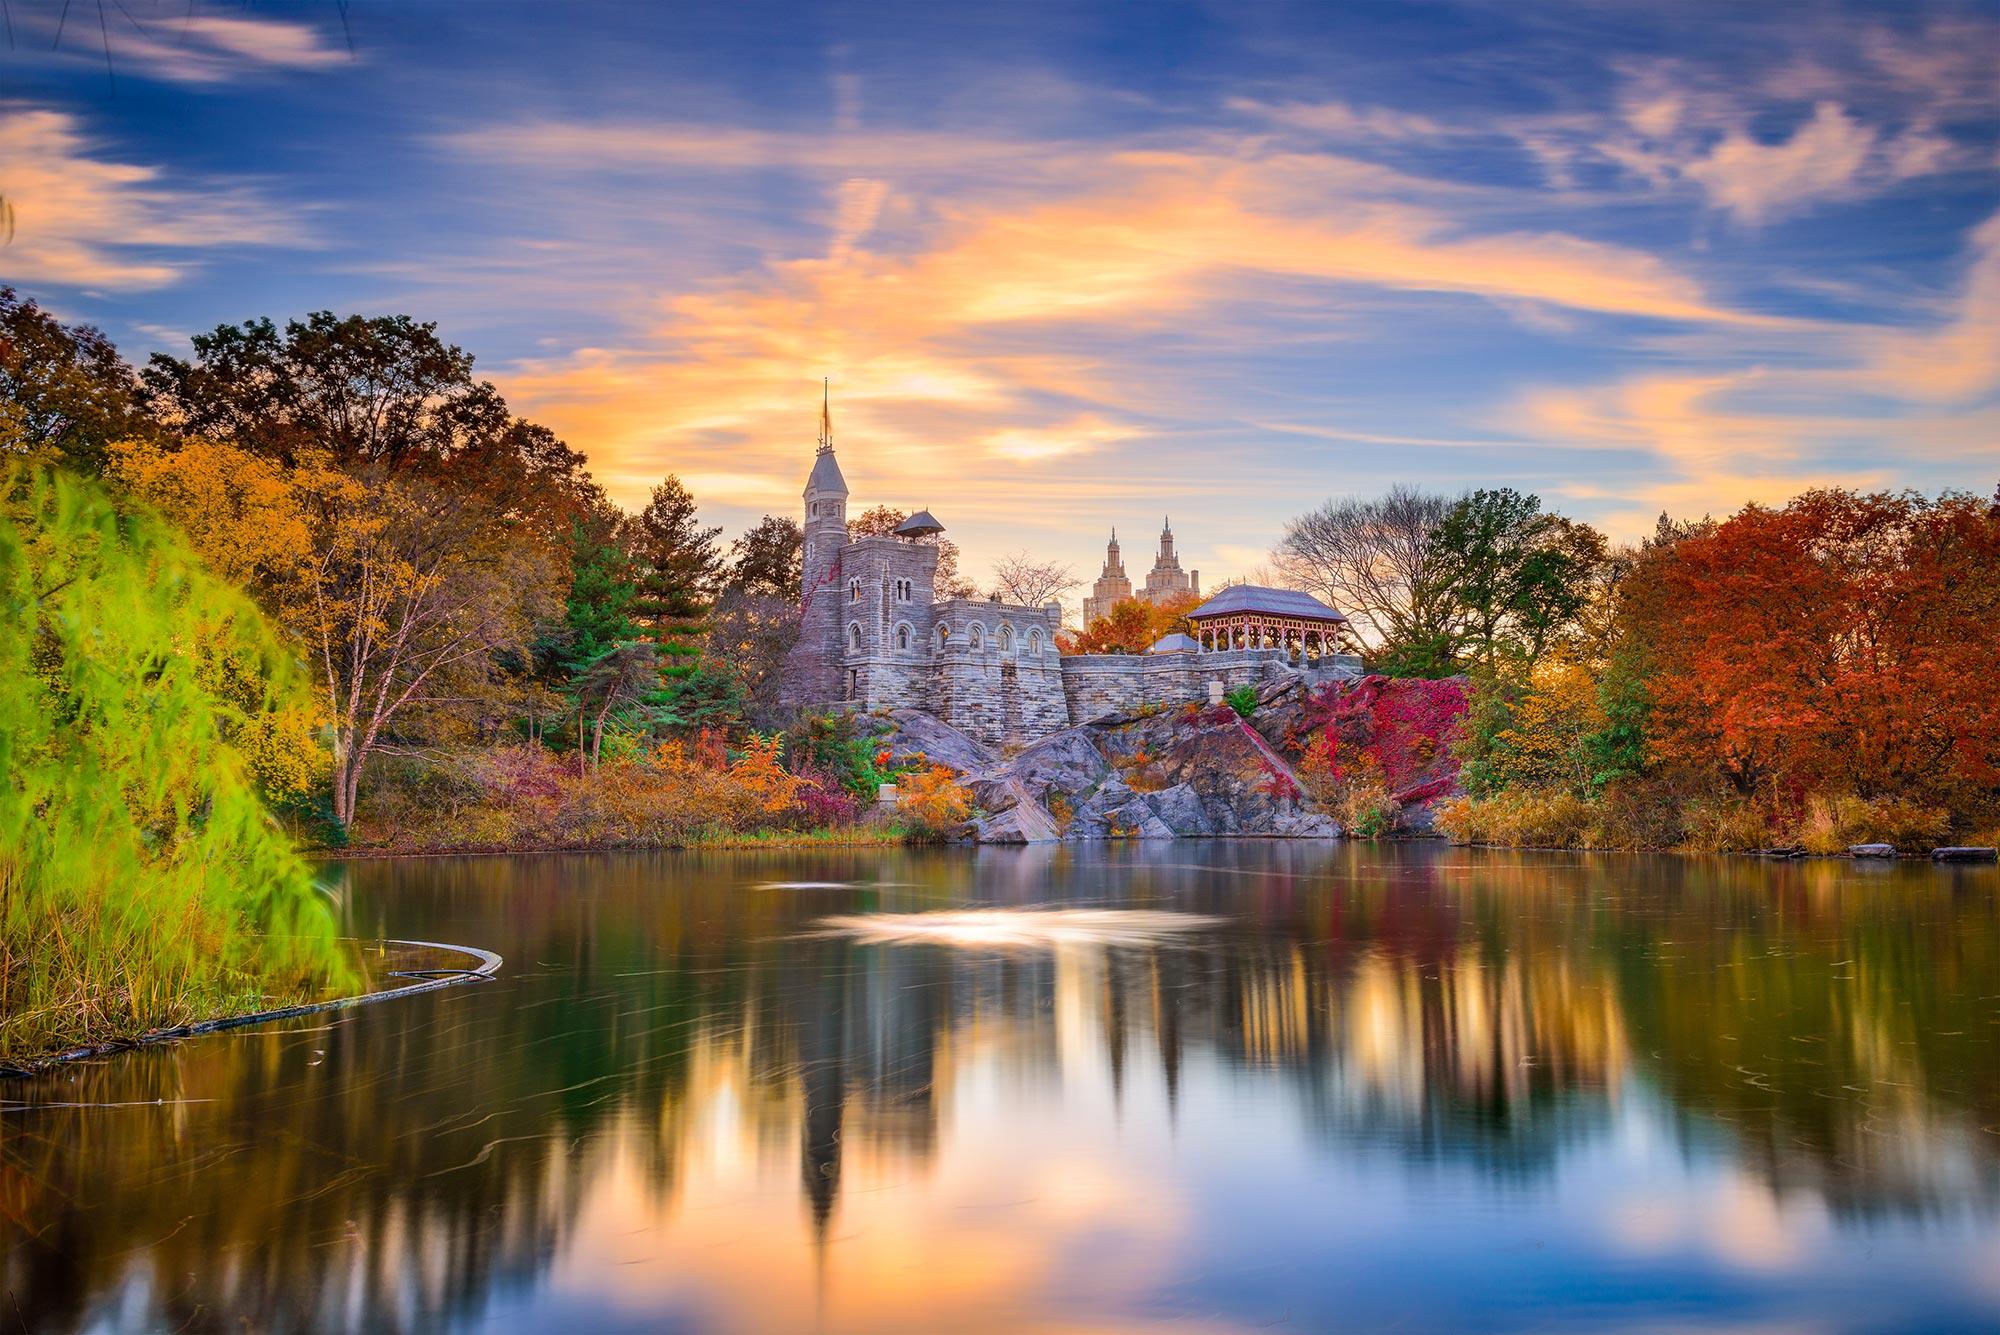 Belvedere Castle in Central Park, New York.